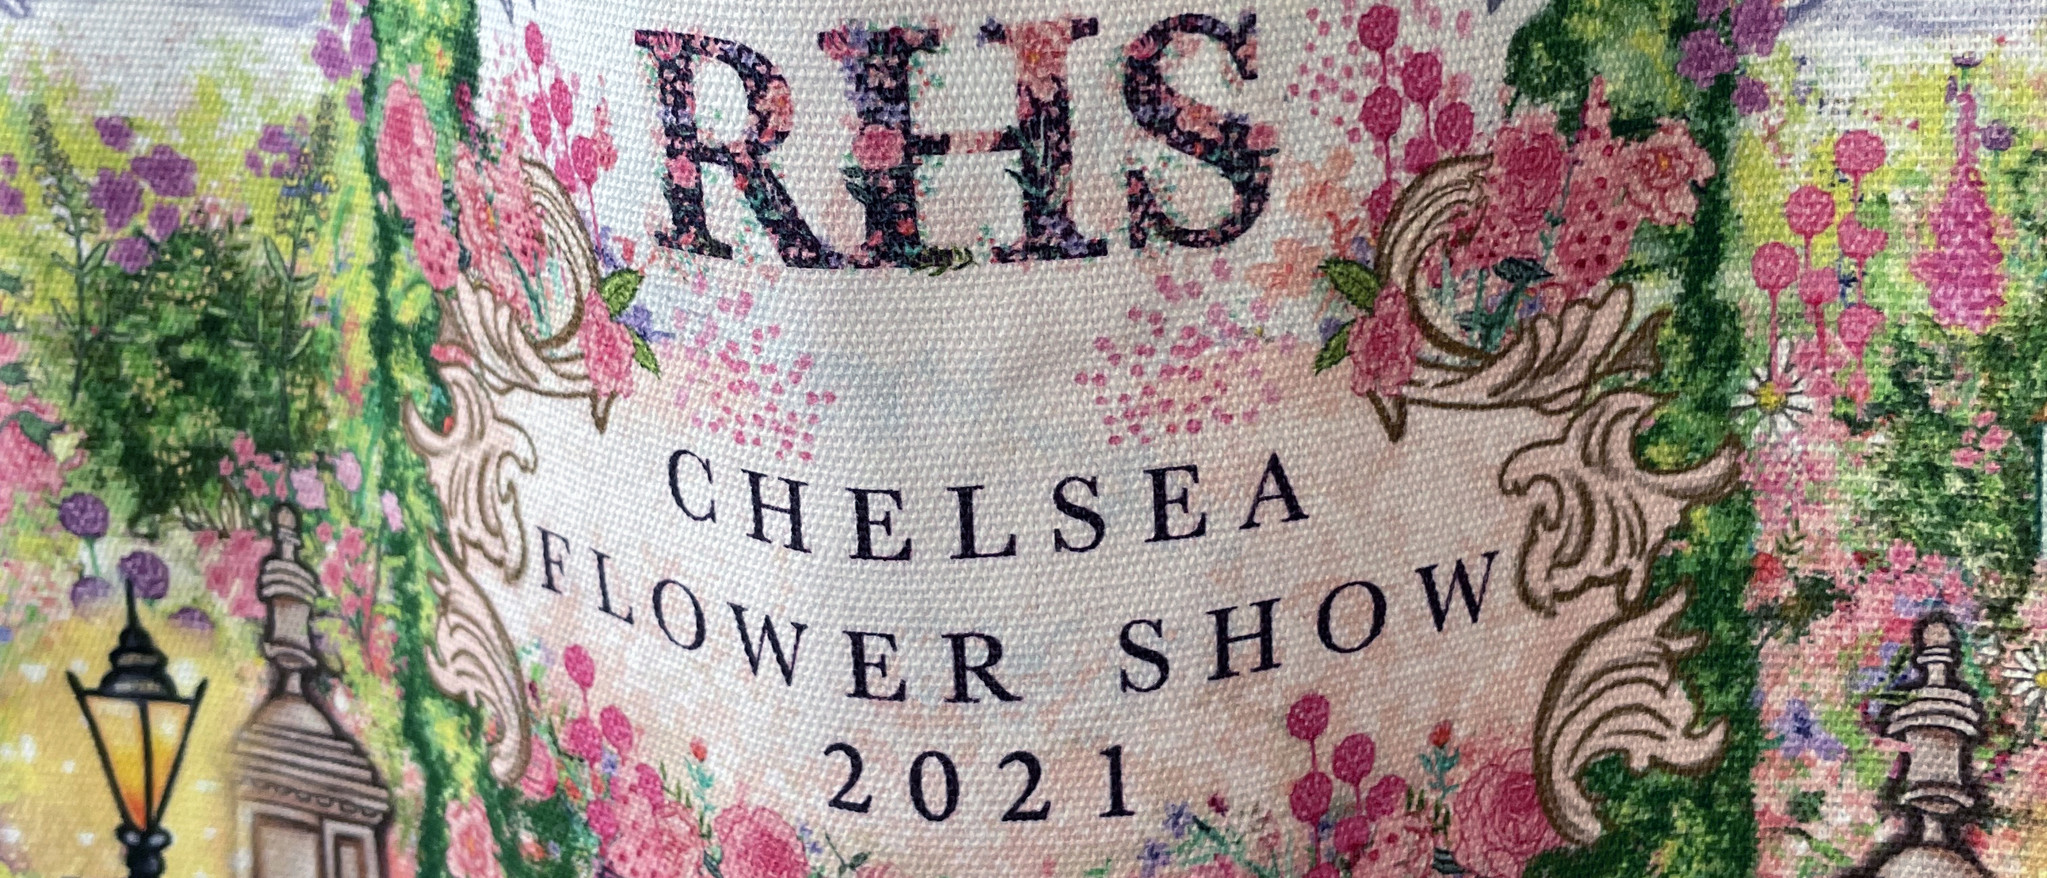 The Chelsea Cheer